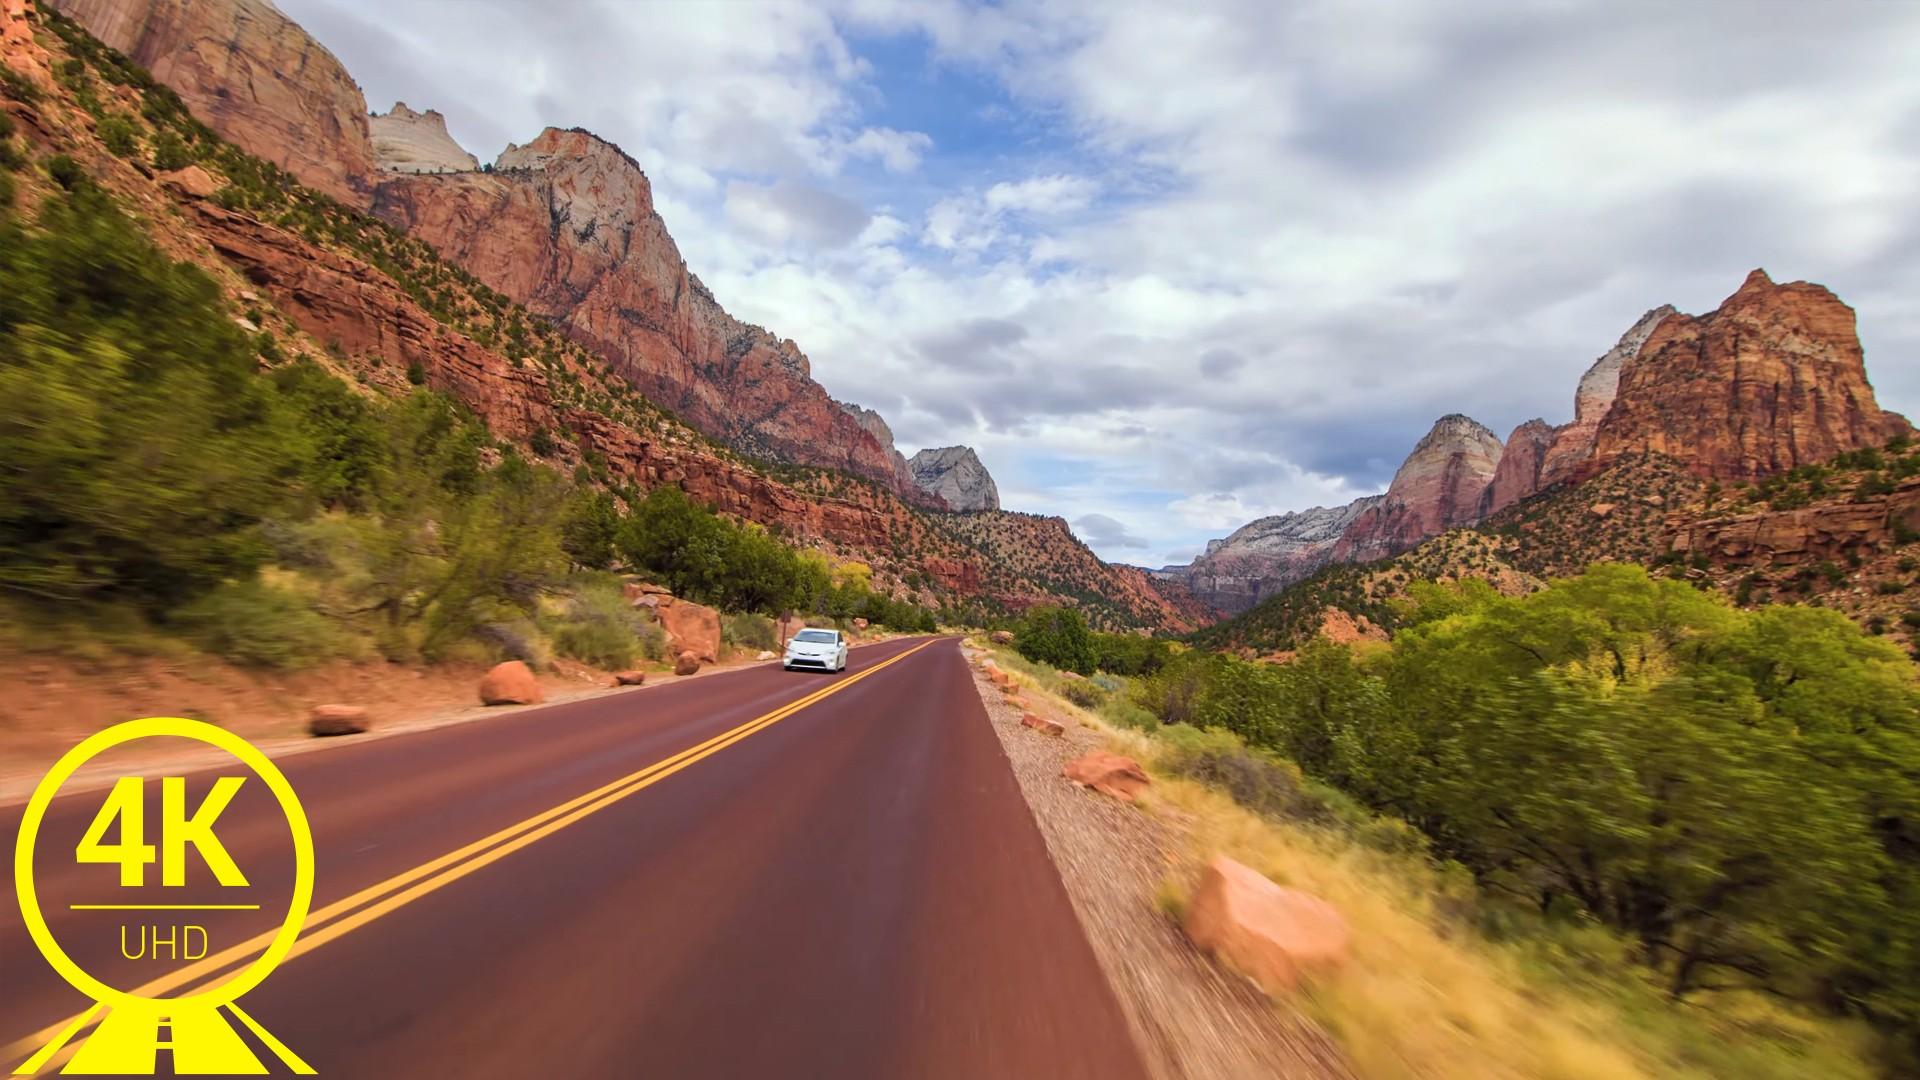 Road Trip to Zion National Park, Utah